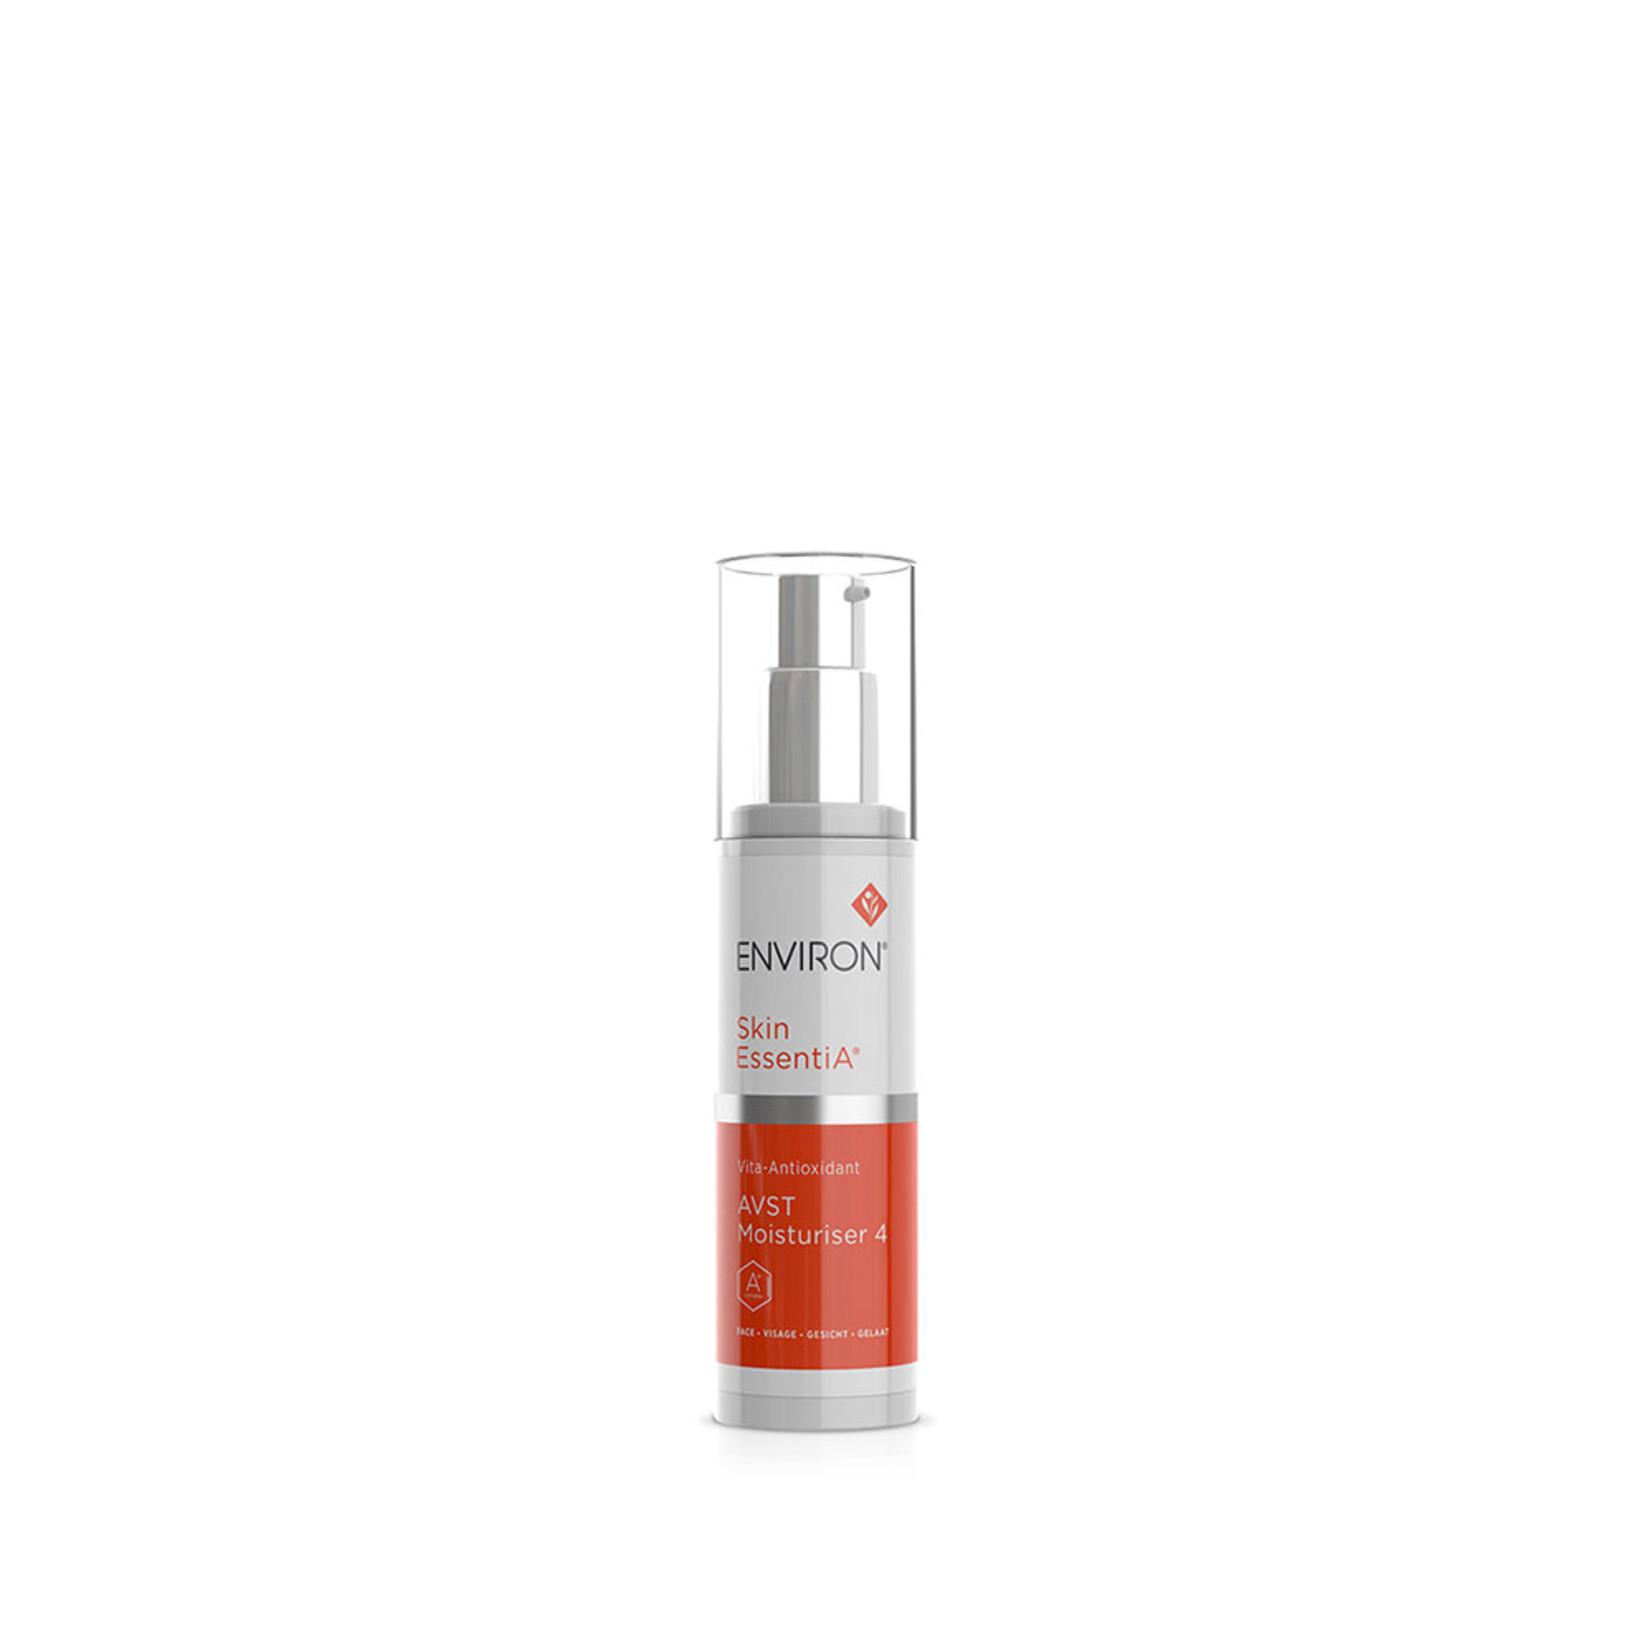 Environ Vita-antioxidant AVST Moisturiser 4 - 50ml